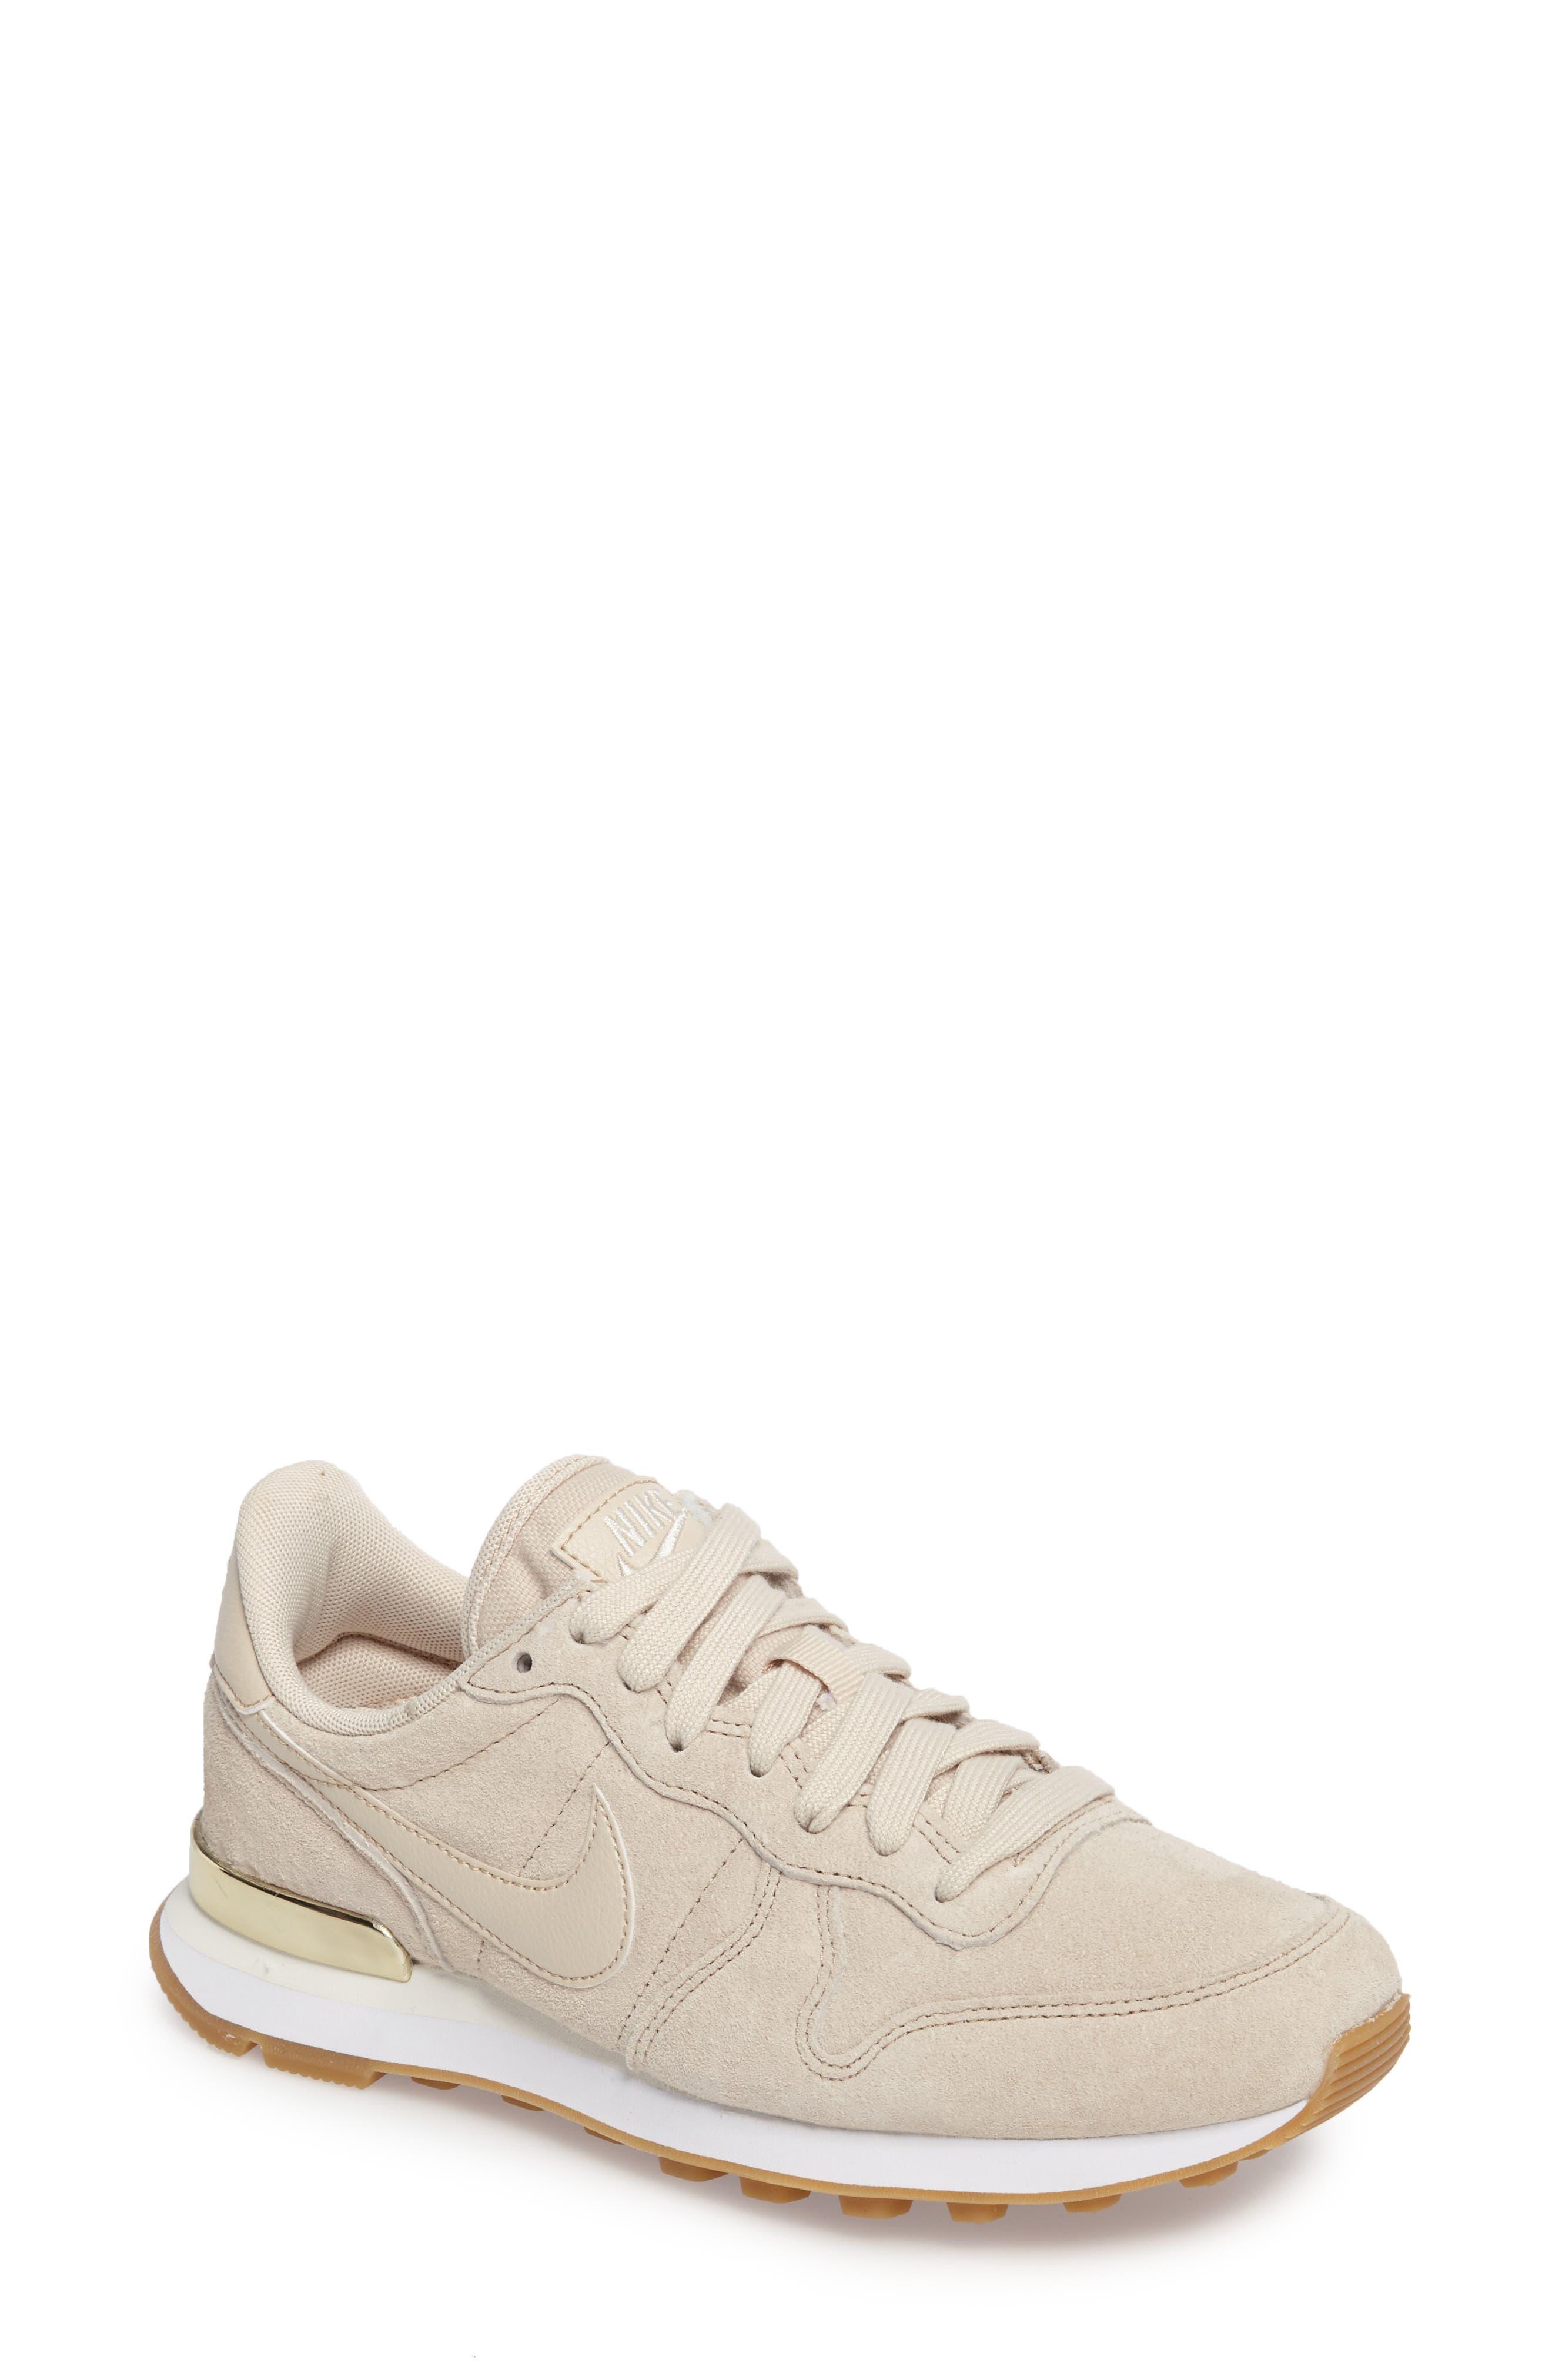 Alternate Image 1 Selected - Nike Internationalist SD Sneaker (Women)